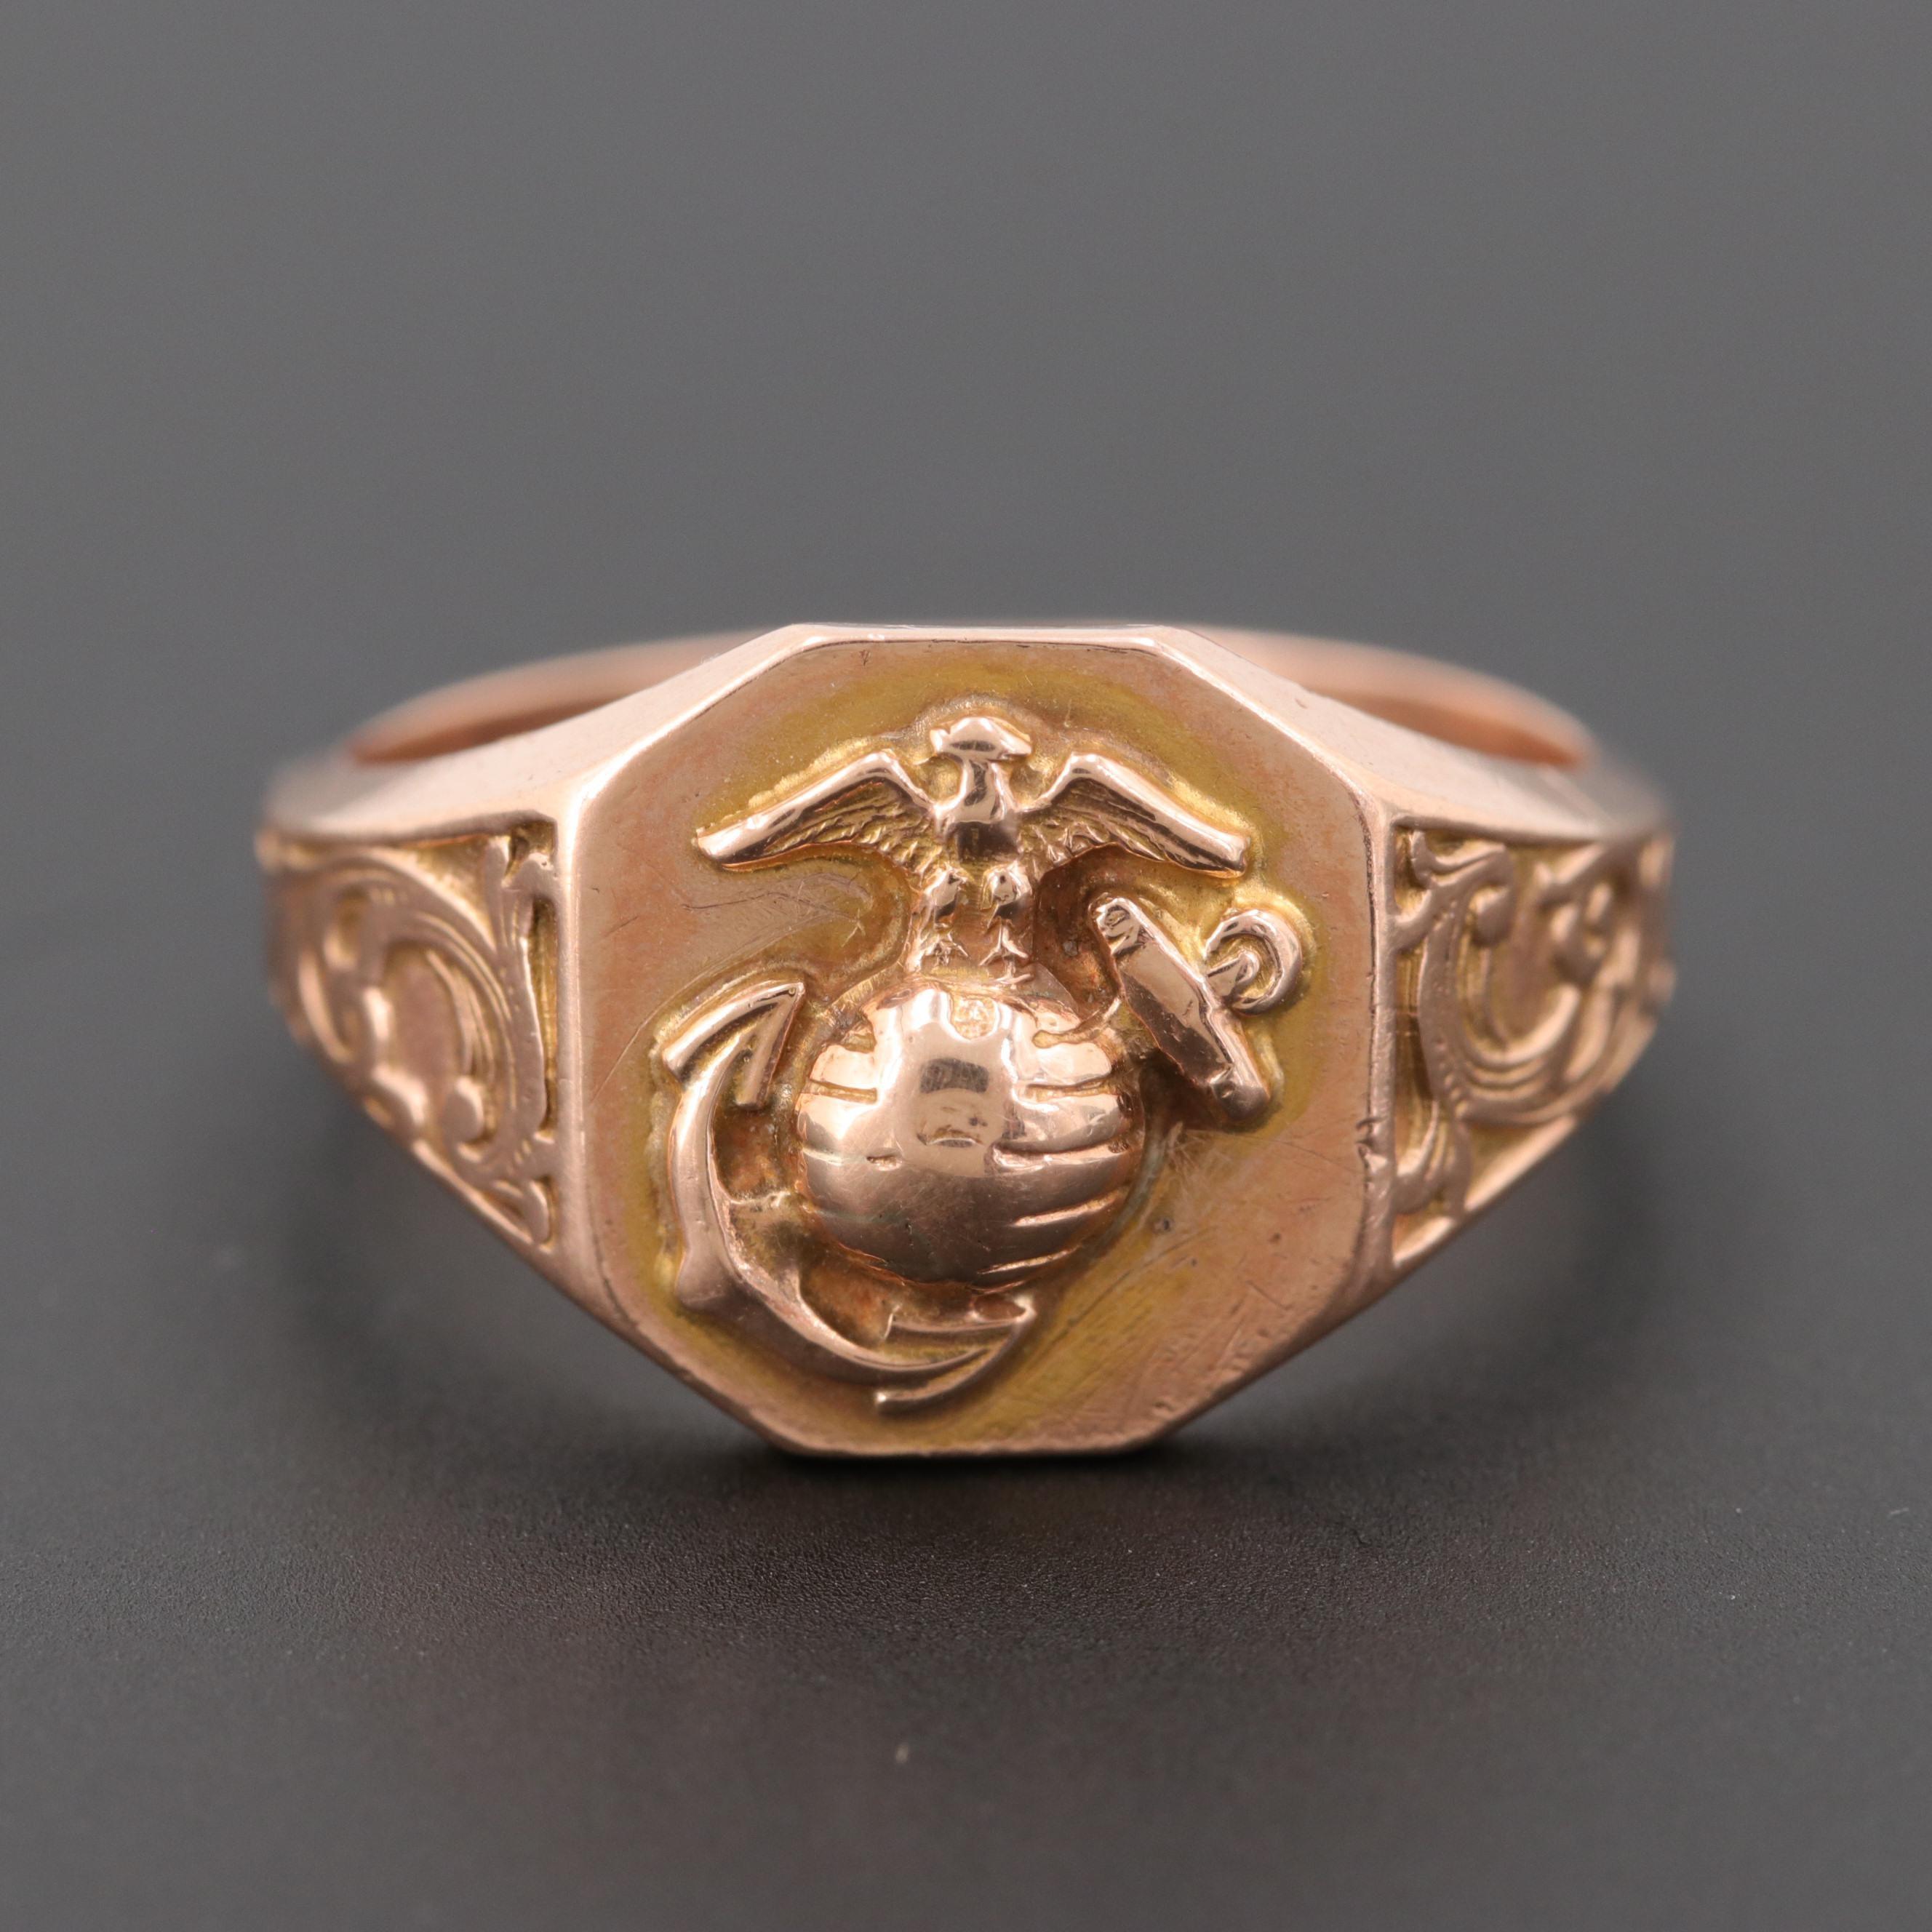 10K Rose Gold Marine Corps Insignia